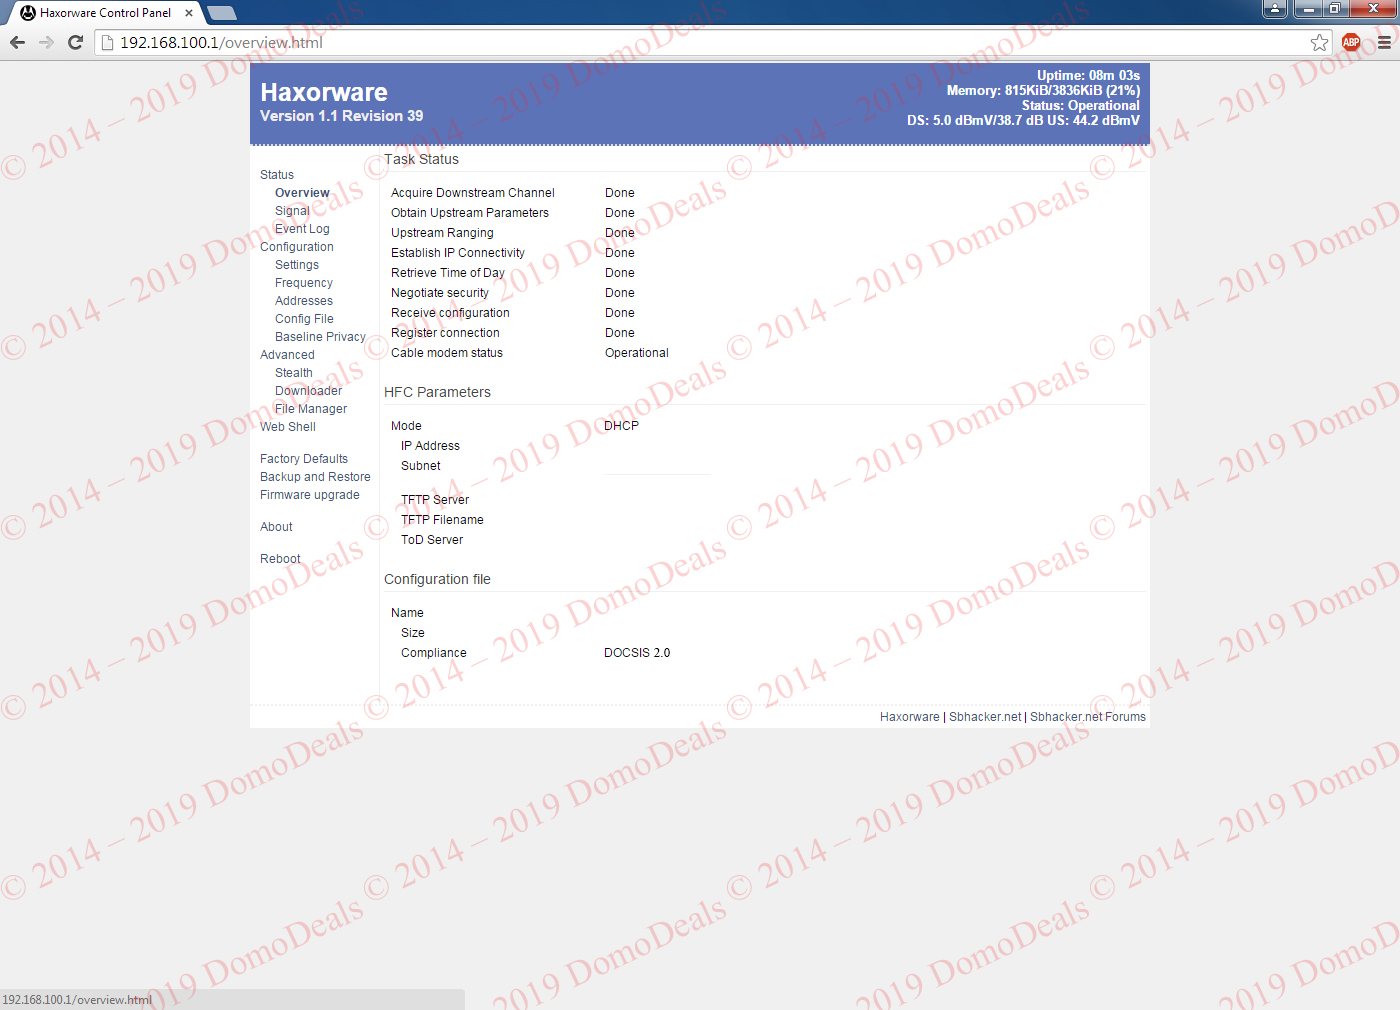 Motorola SB5101 premod with Haxorware